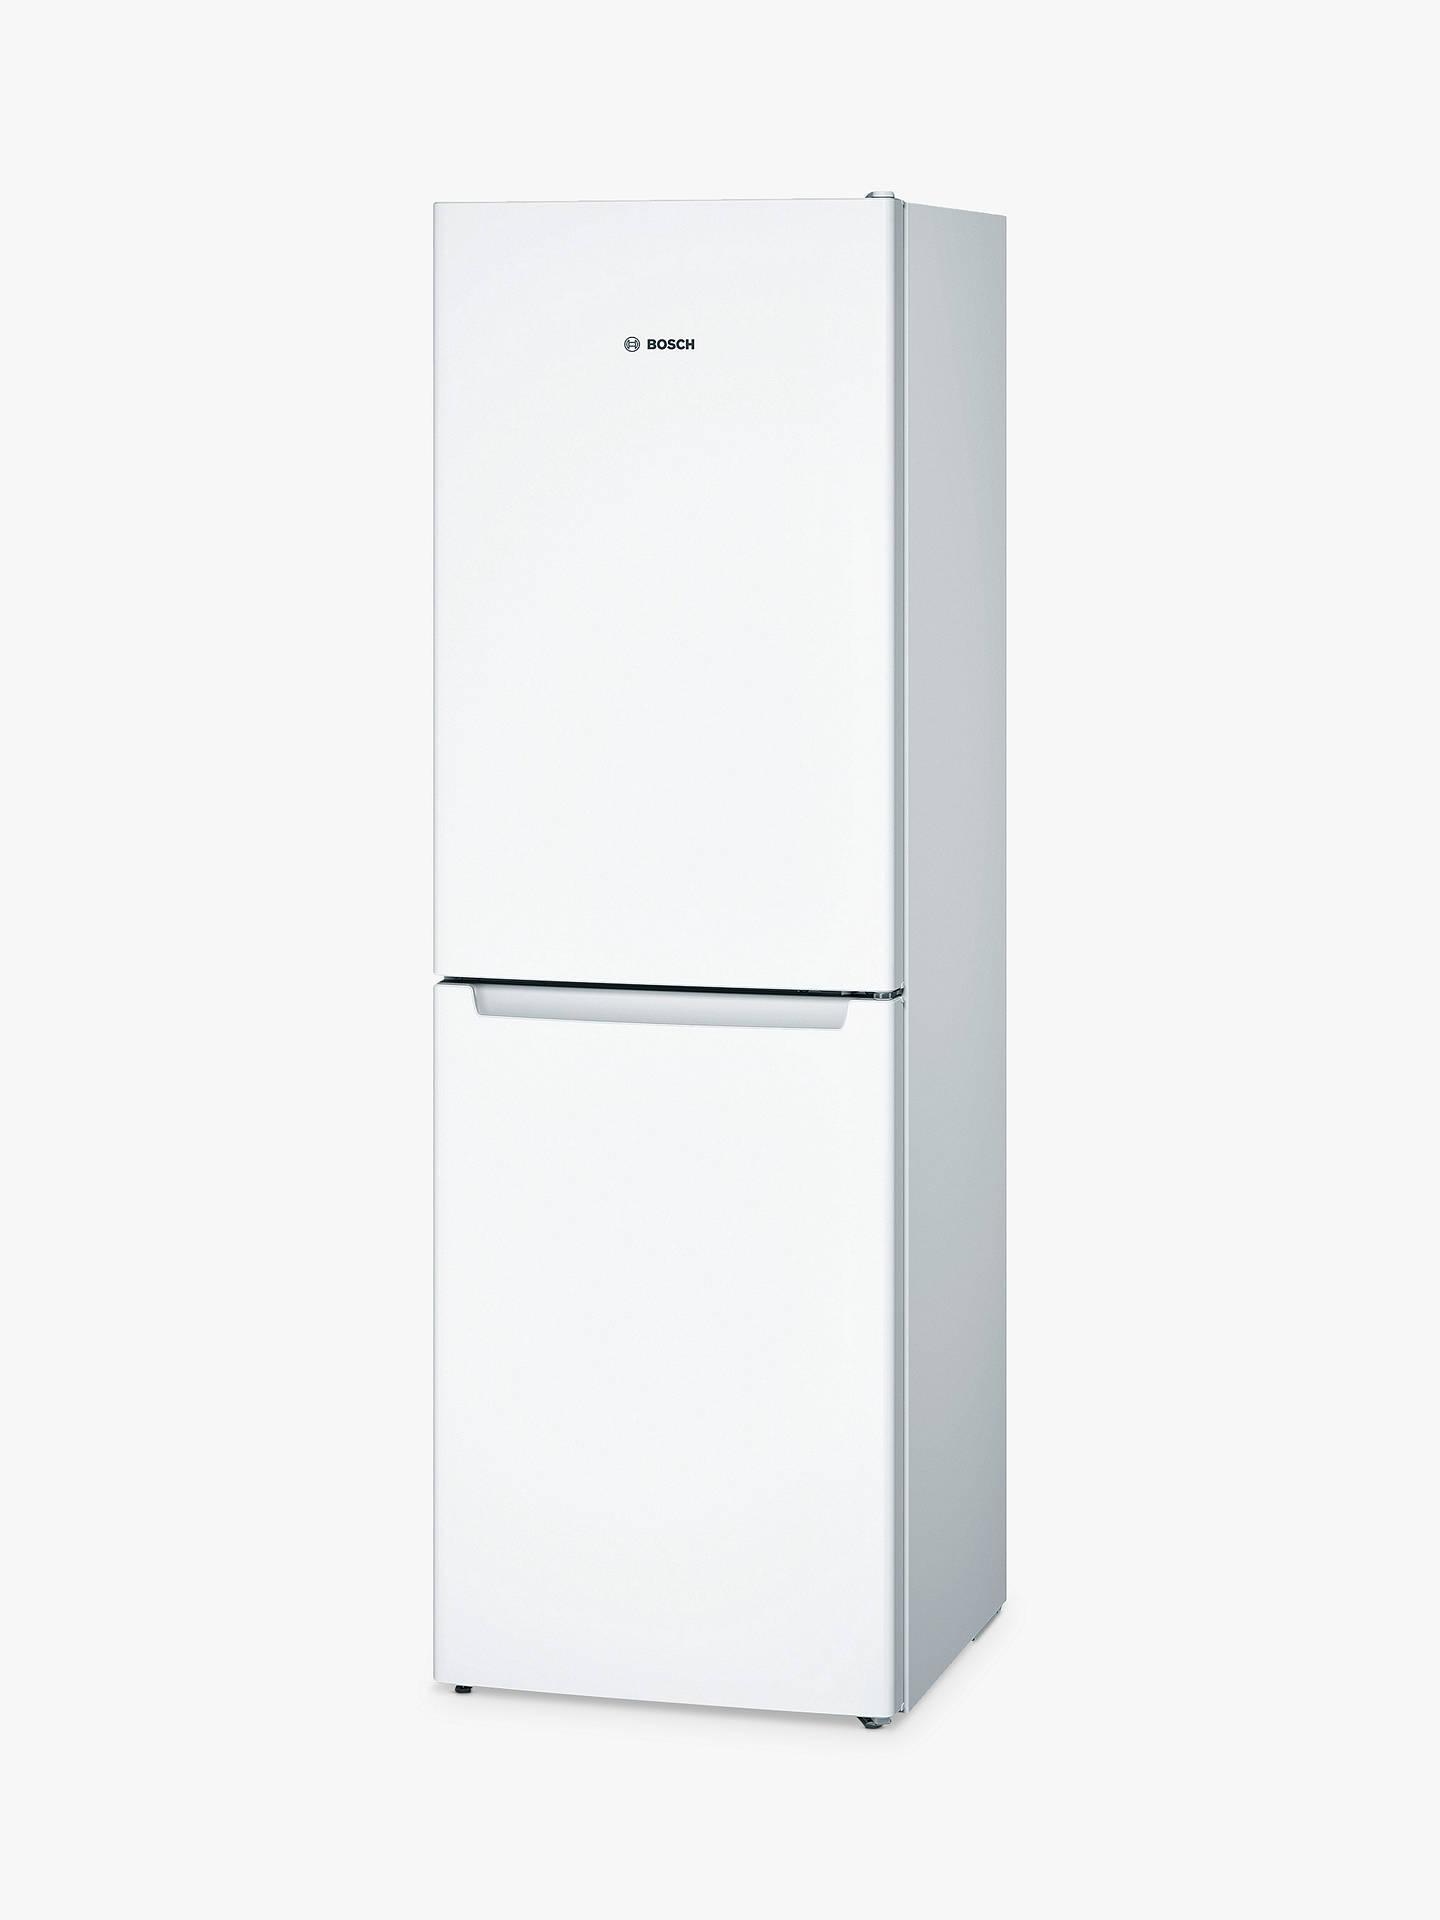 bosch kgn34nw3ag freestanding fridge freezer a energy rating rh johnlewis com Bosch Refrigerator Problems Bosch Counter-Depth Refrigerator